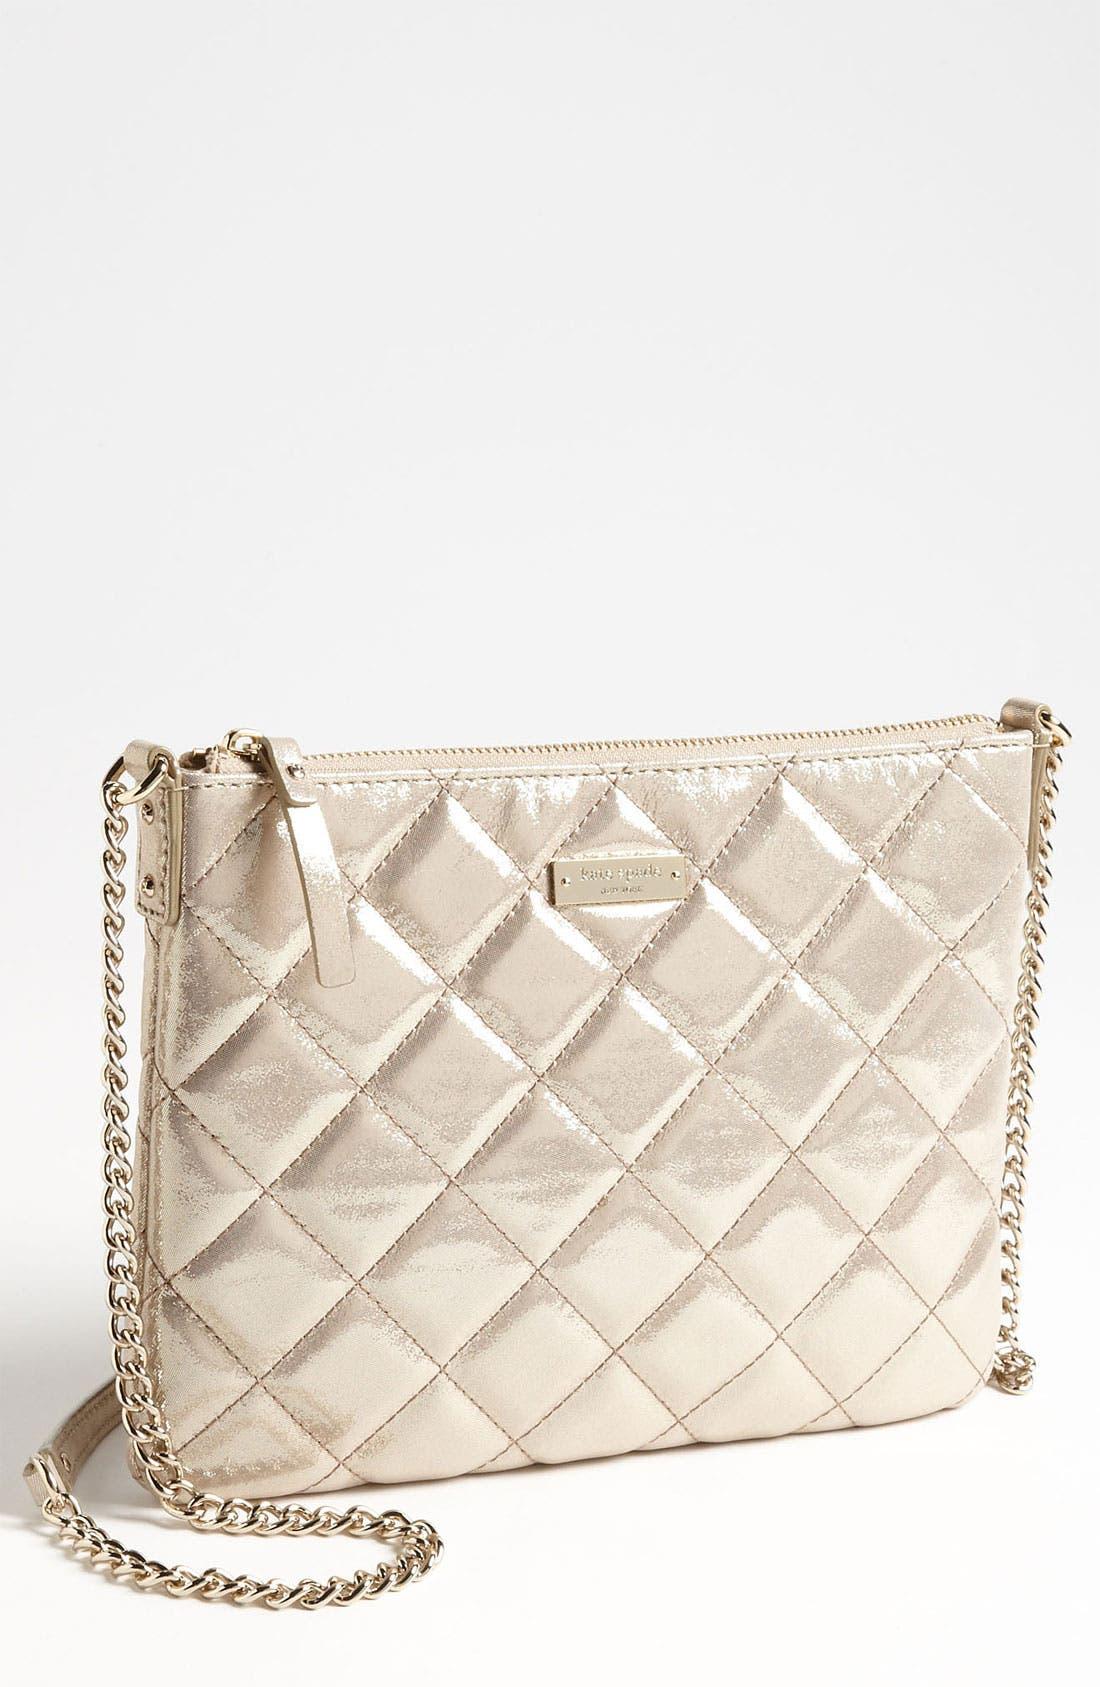 Alternate Image 1 Selected - kate spade new york 'gold coast - ginnie' crossbody bag